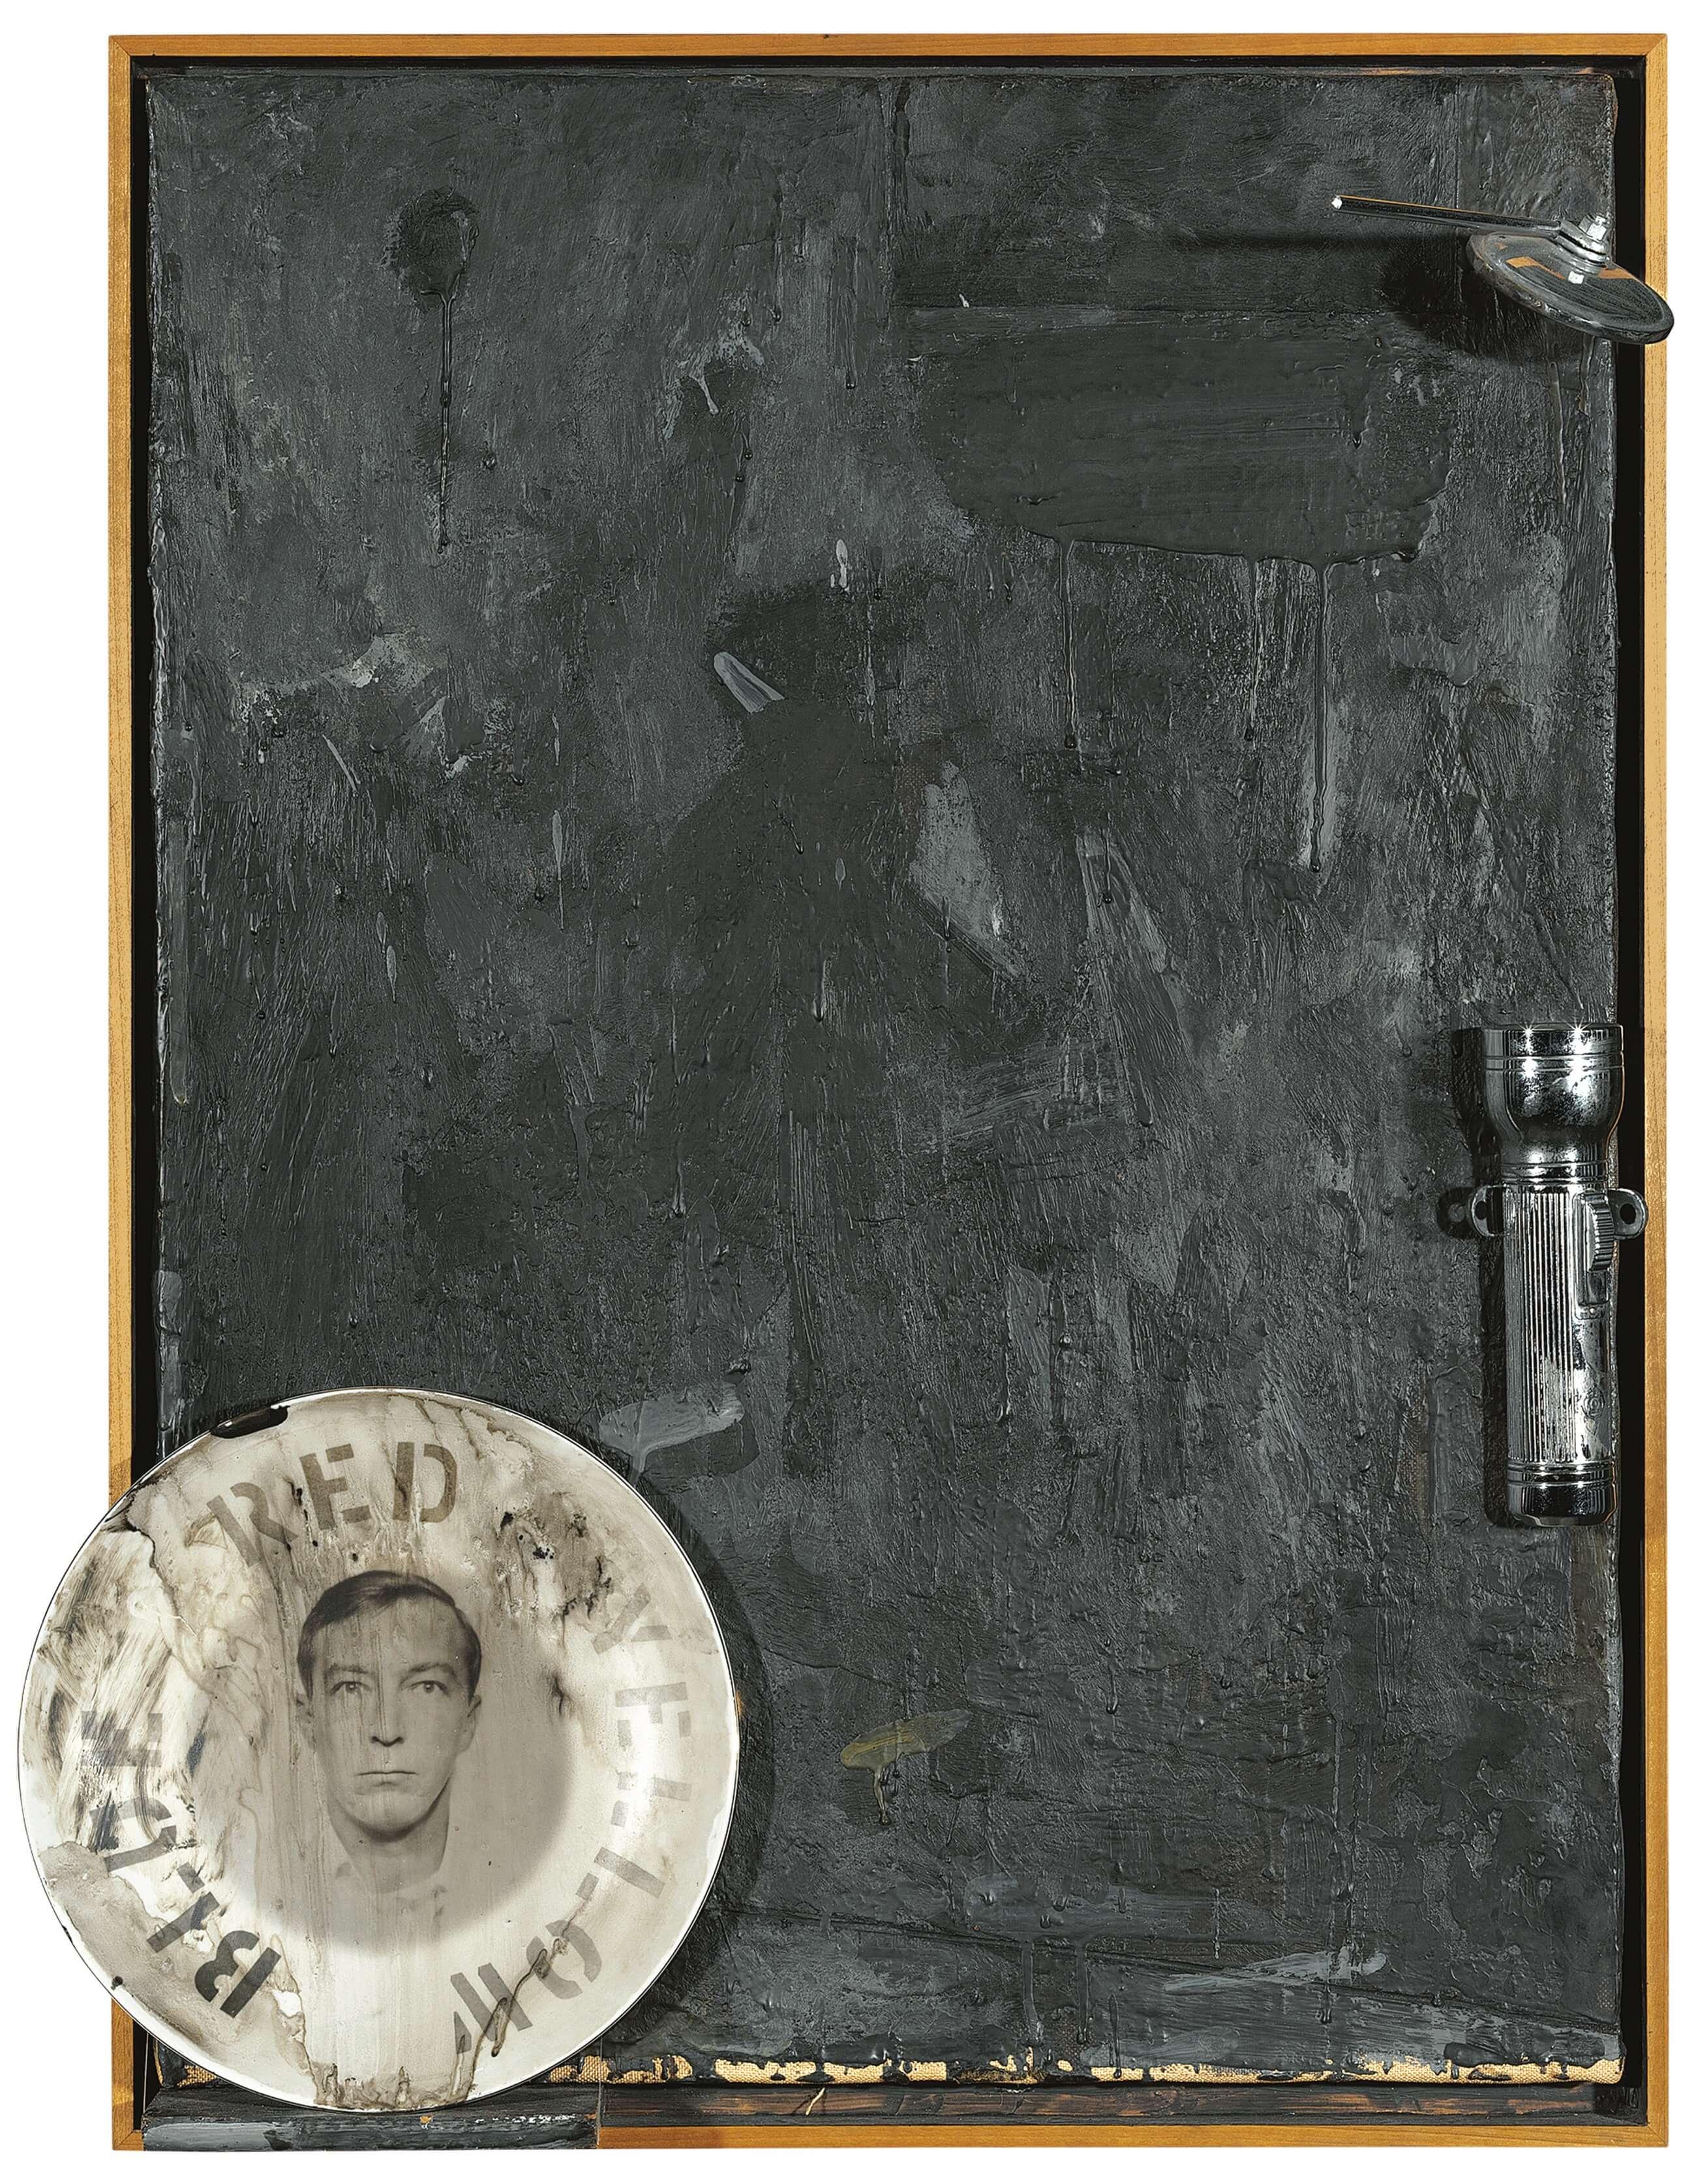 Souvenir, 1964, by Jasper Johns